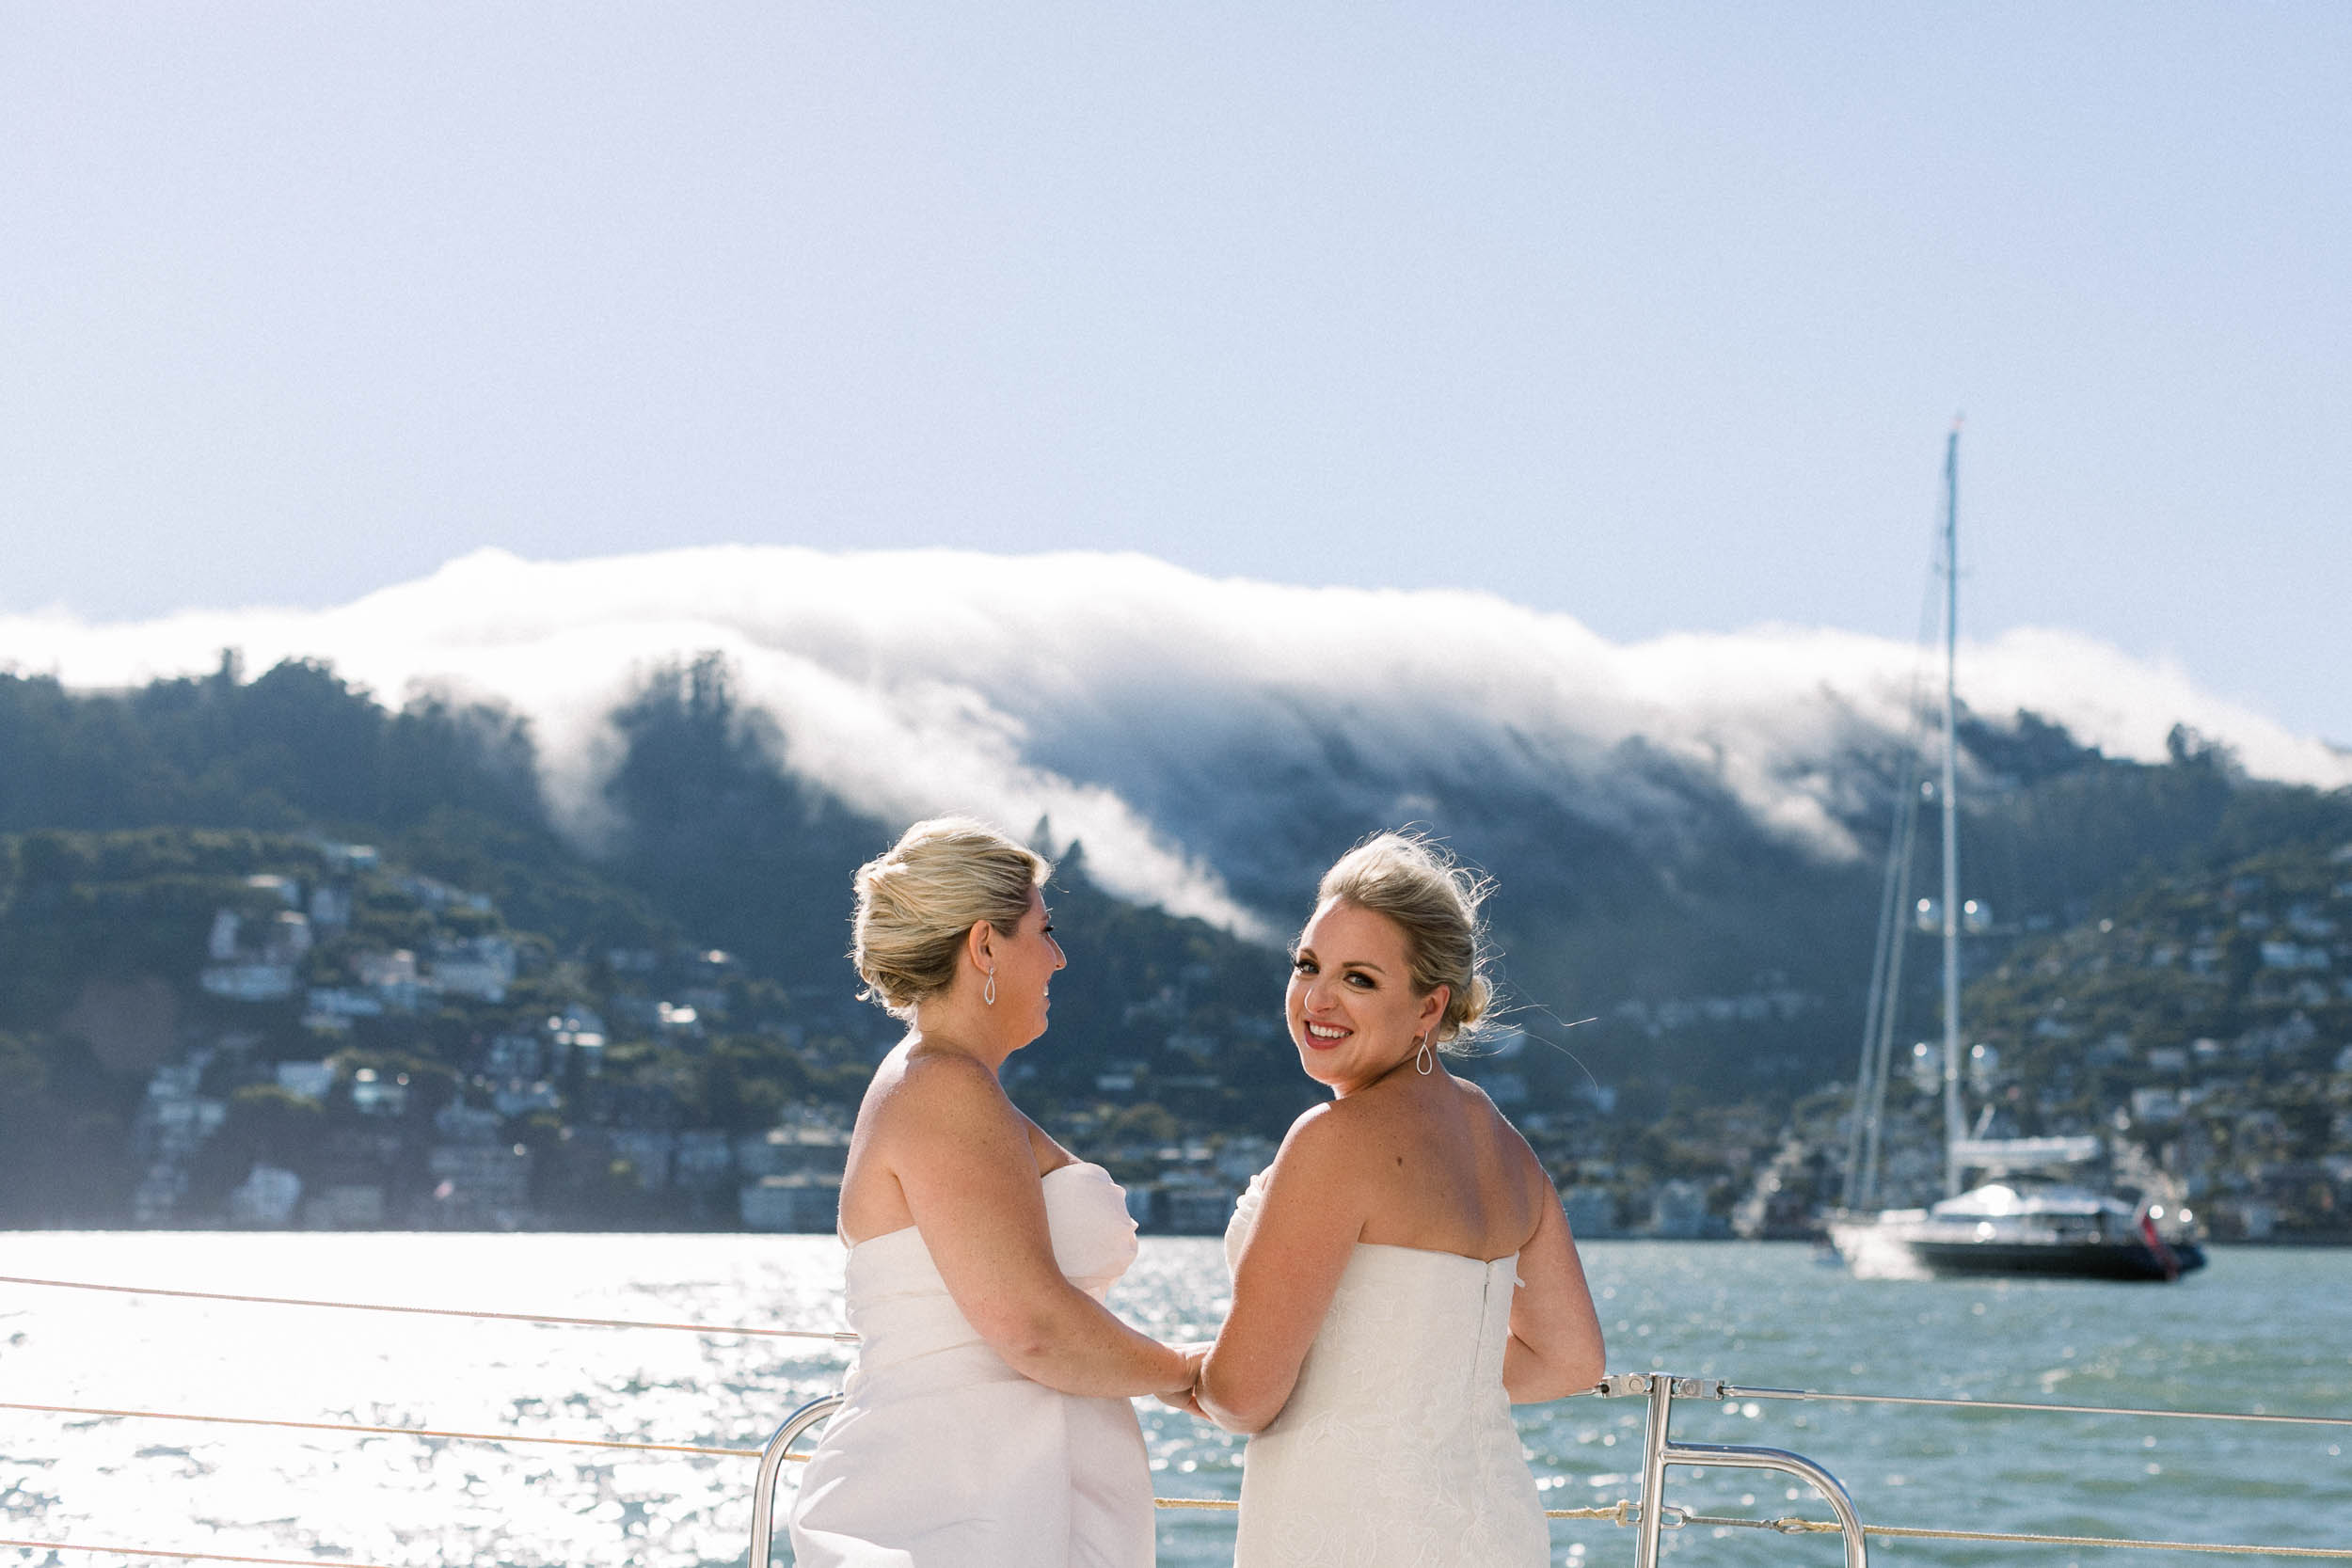 092218ER415_Sausalito Yacht Club Wedding_Buena Lane Photography.jpg